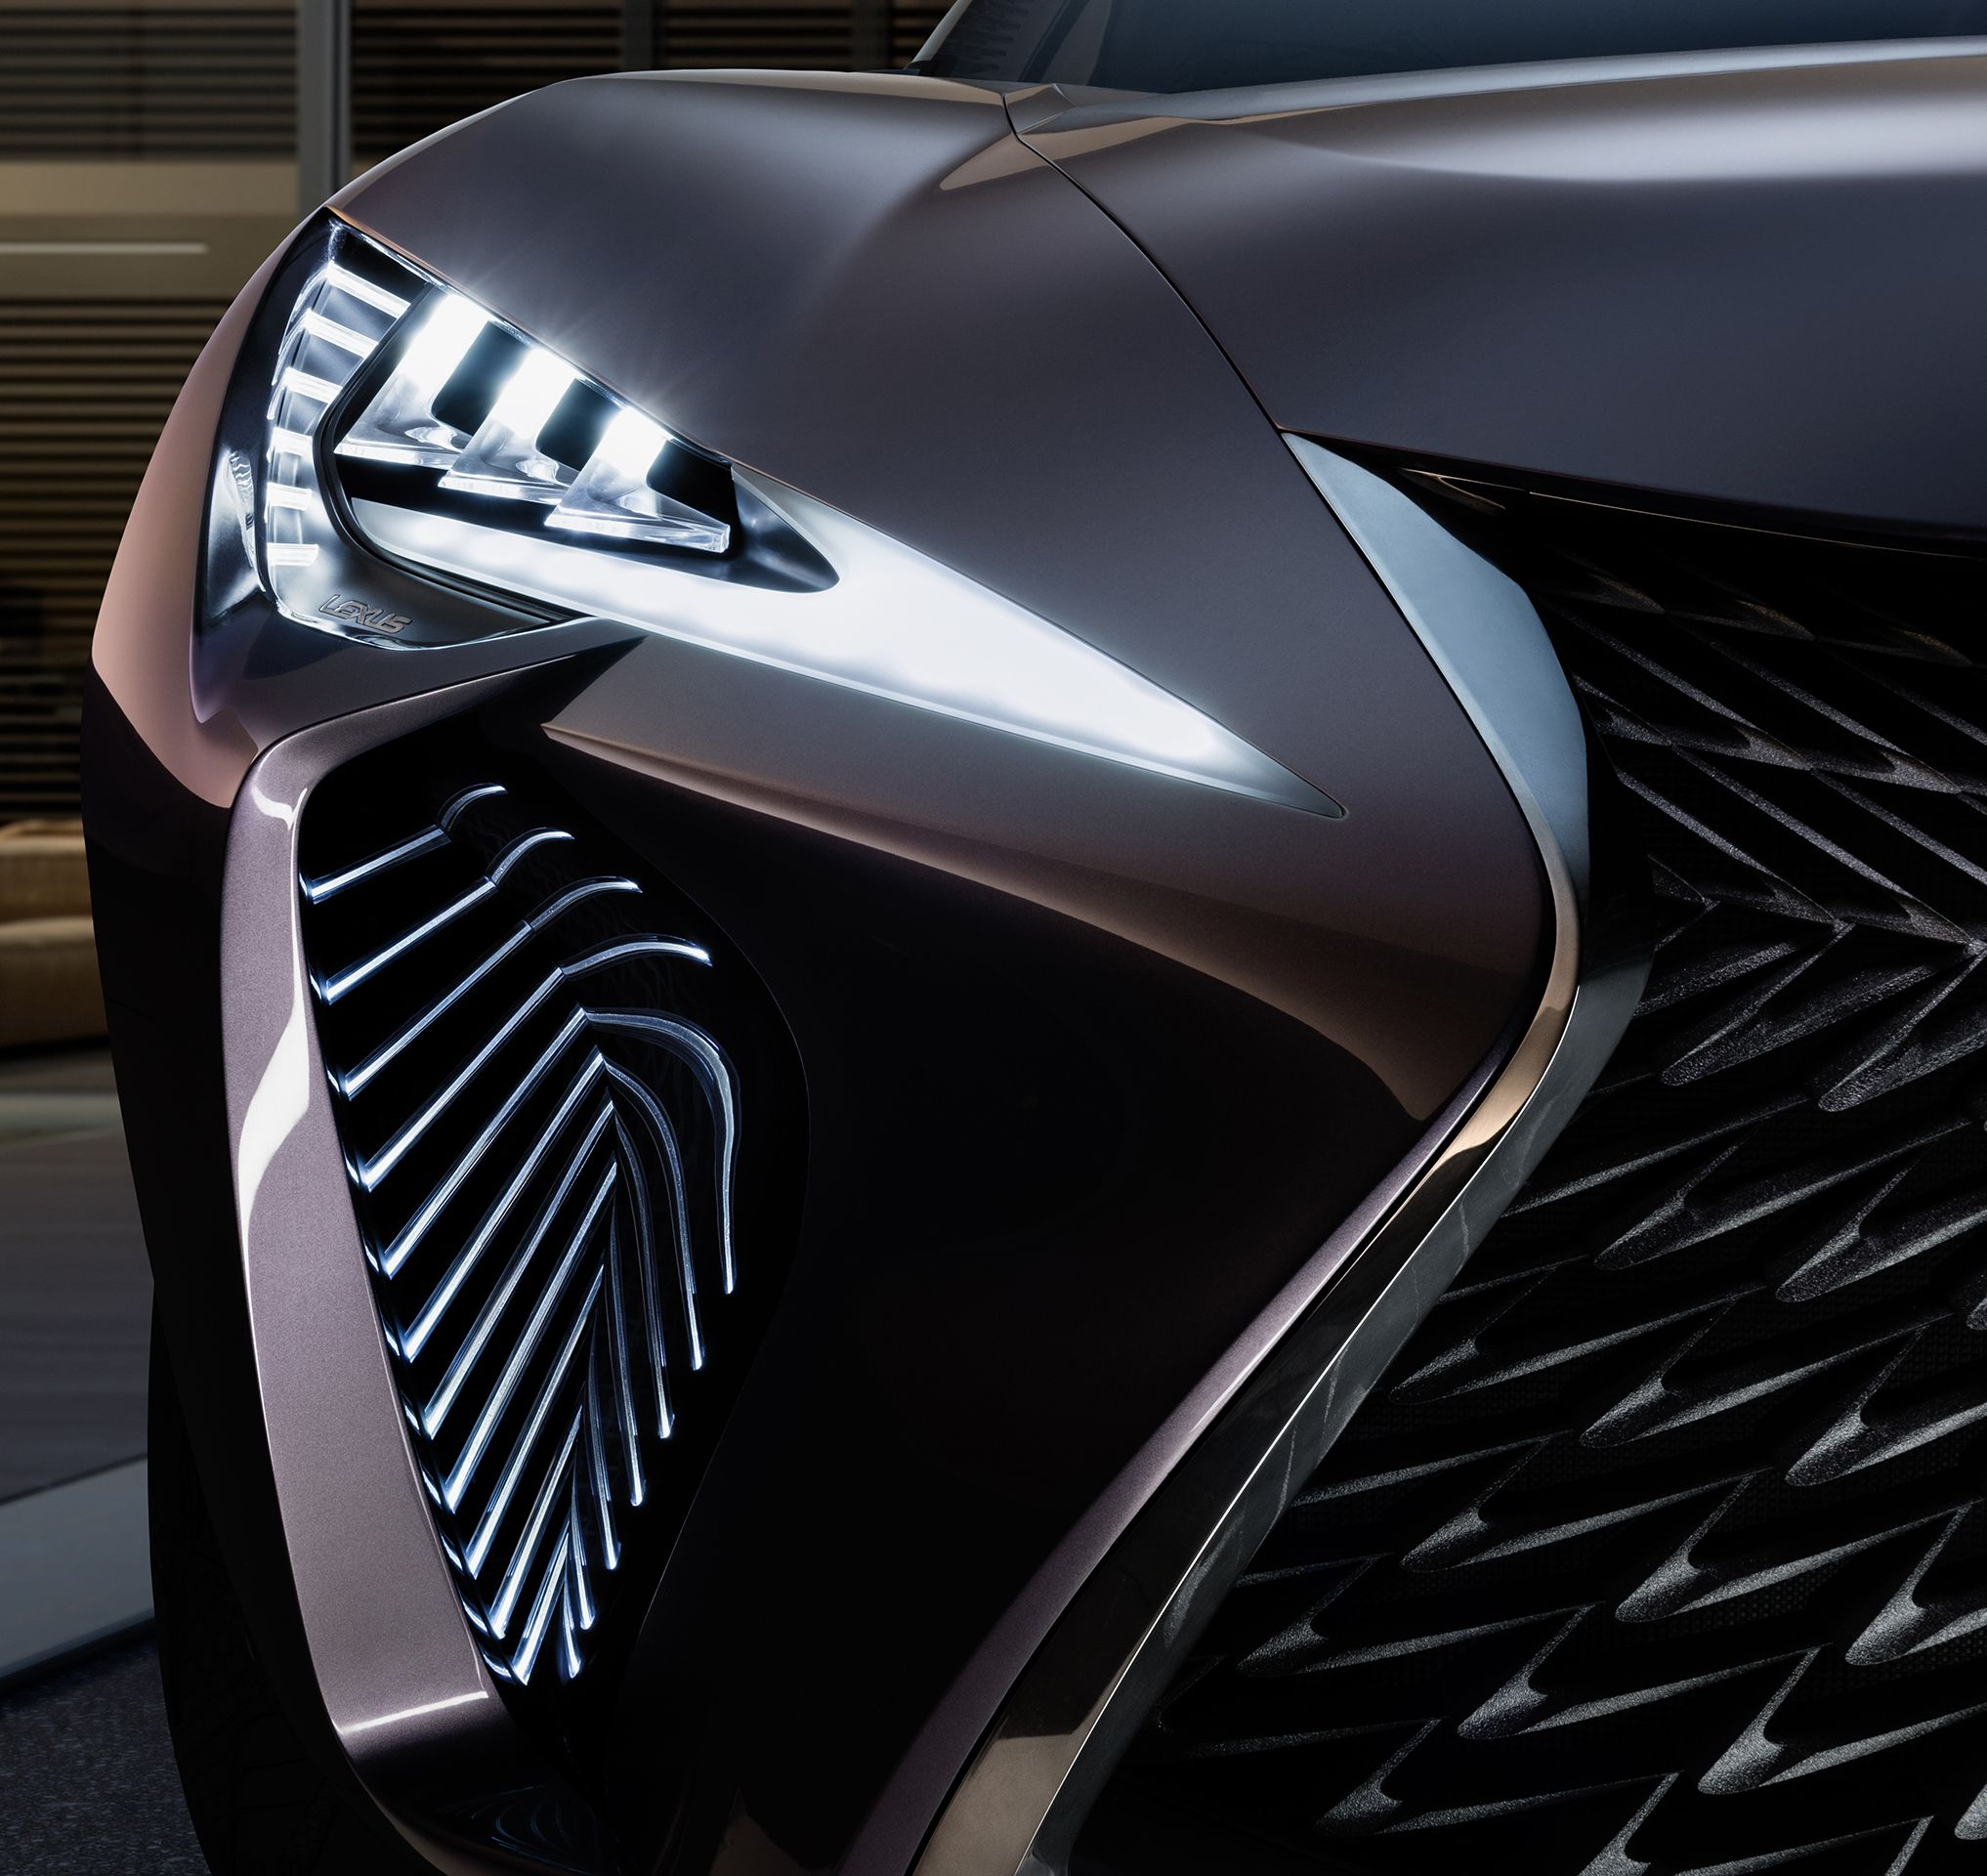 Ux 200 Concept Cars Lexus Car Headlights